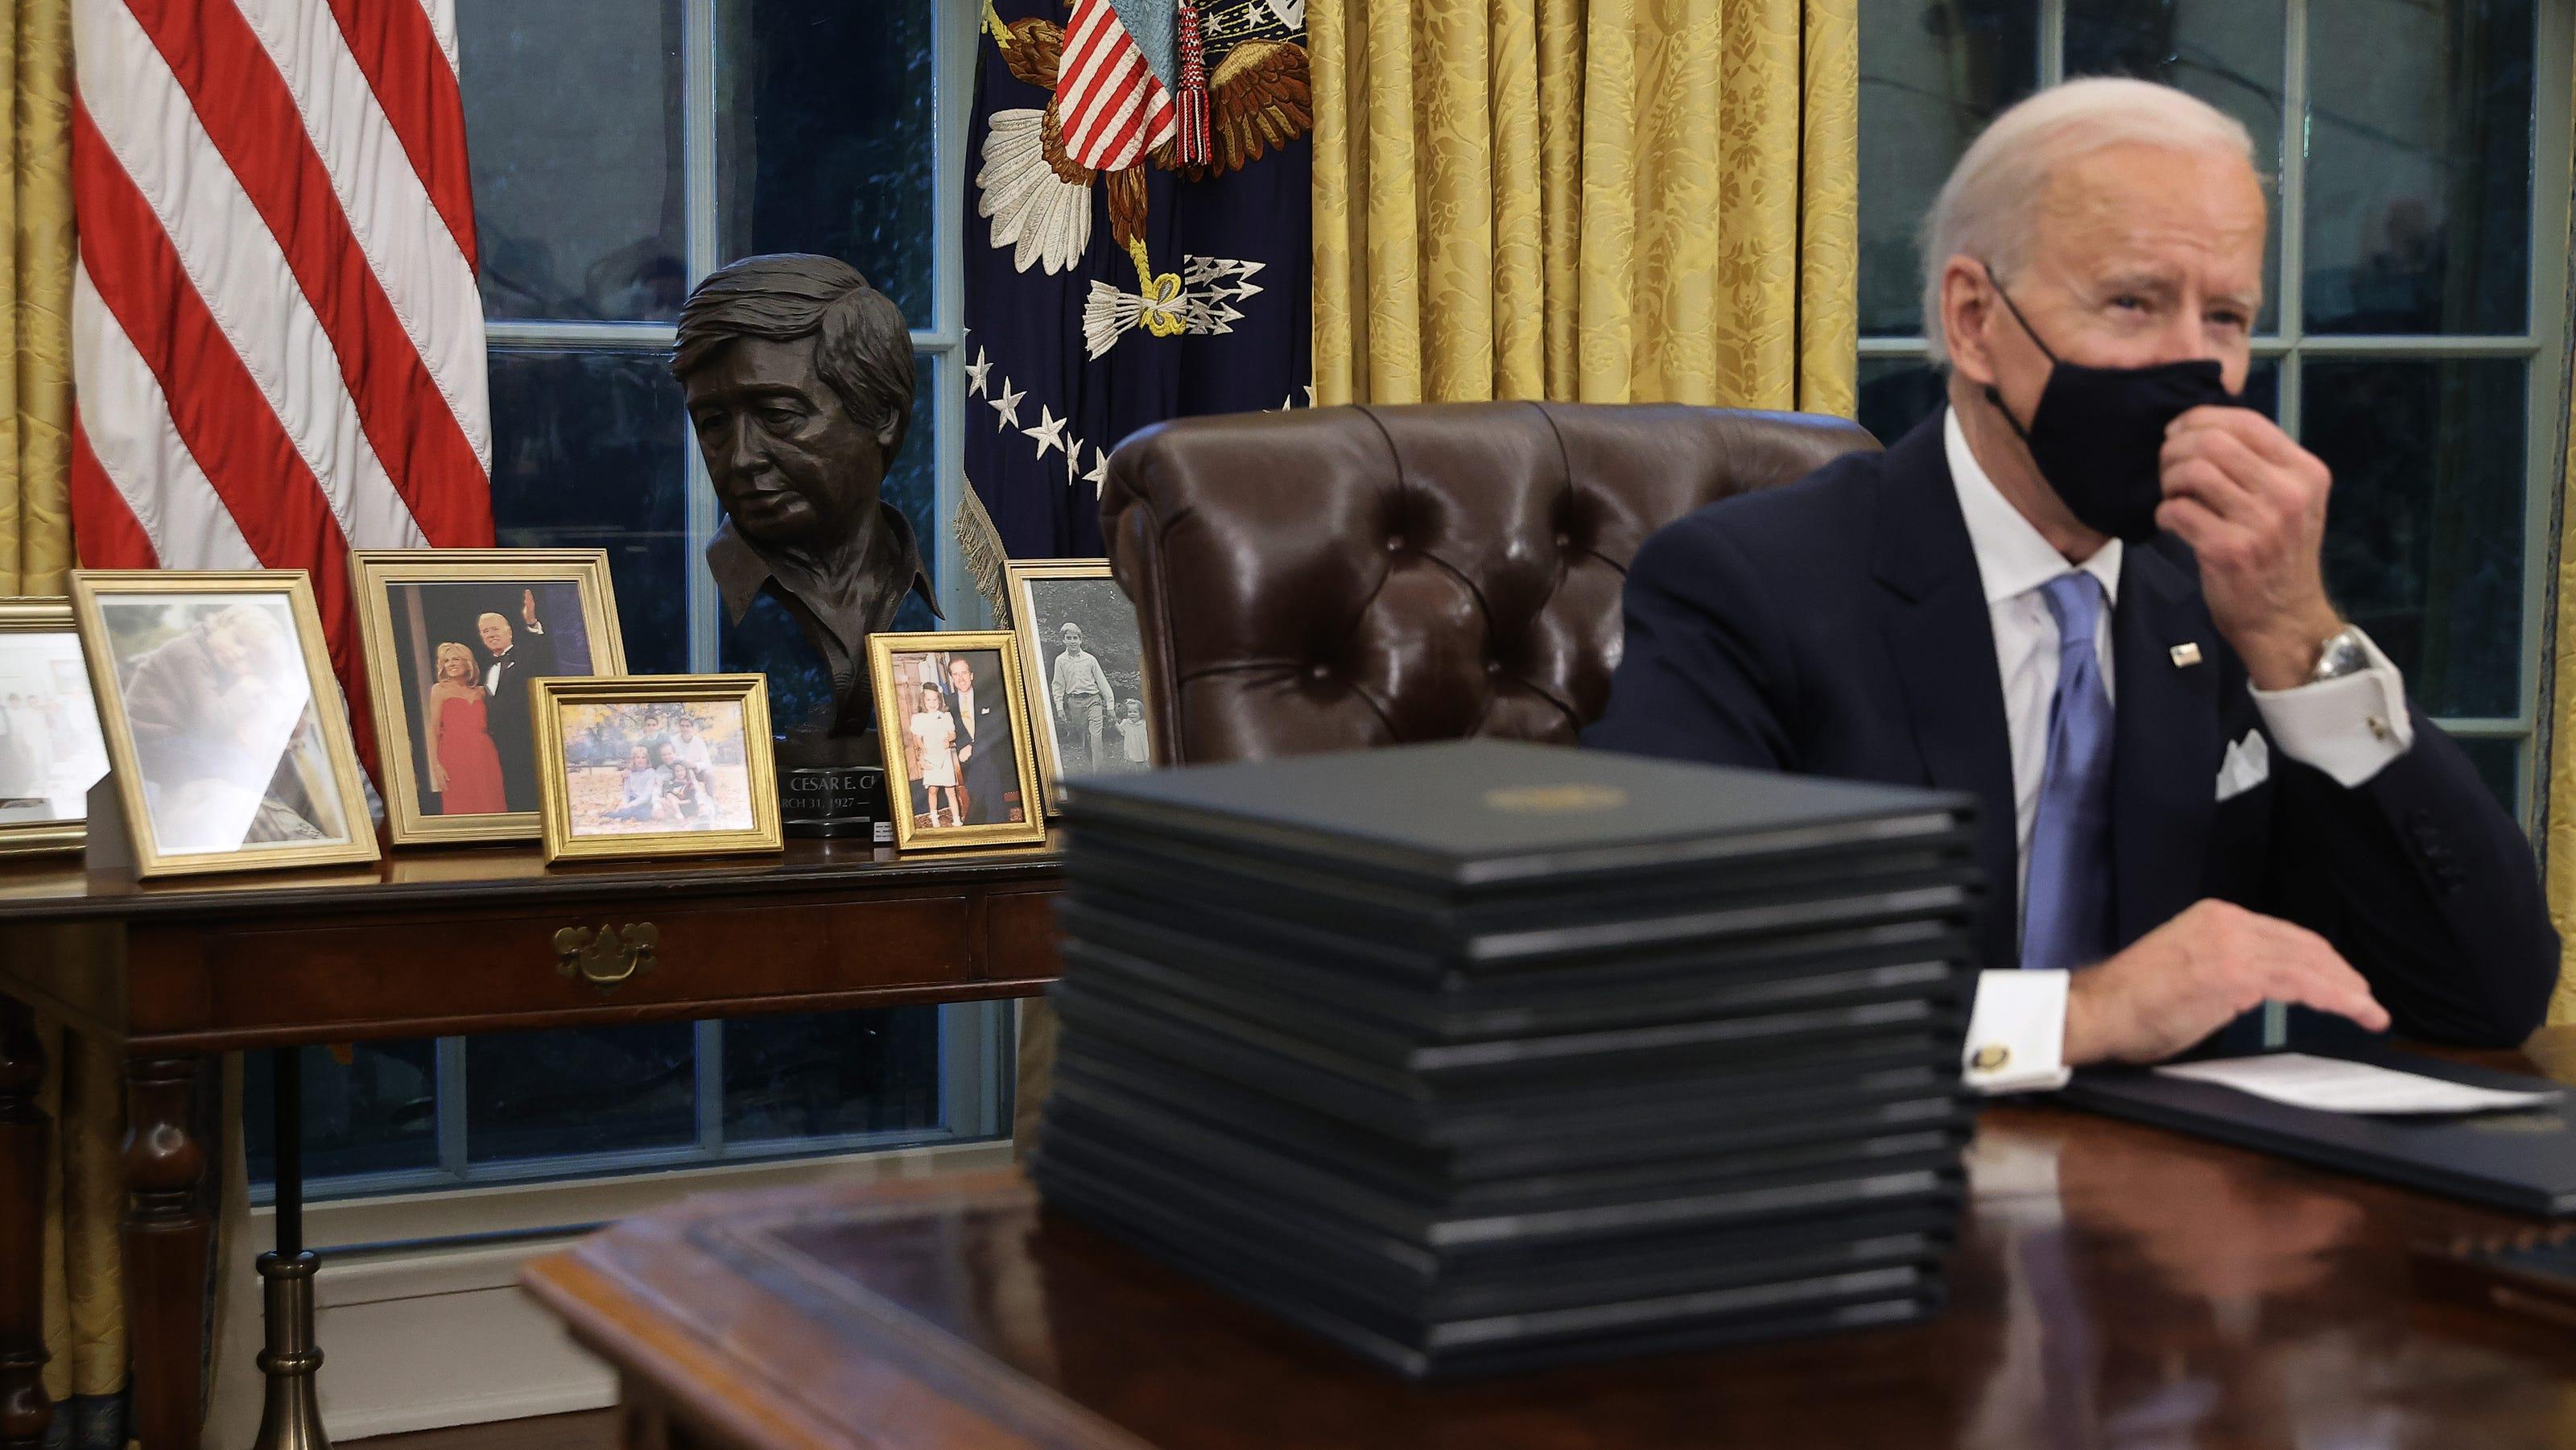 Full List of Biden's Destructive Executive Orders